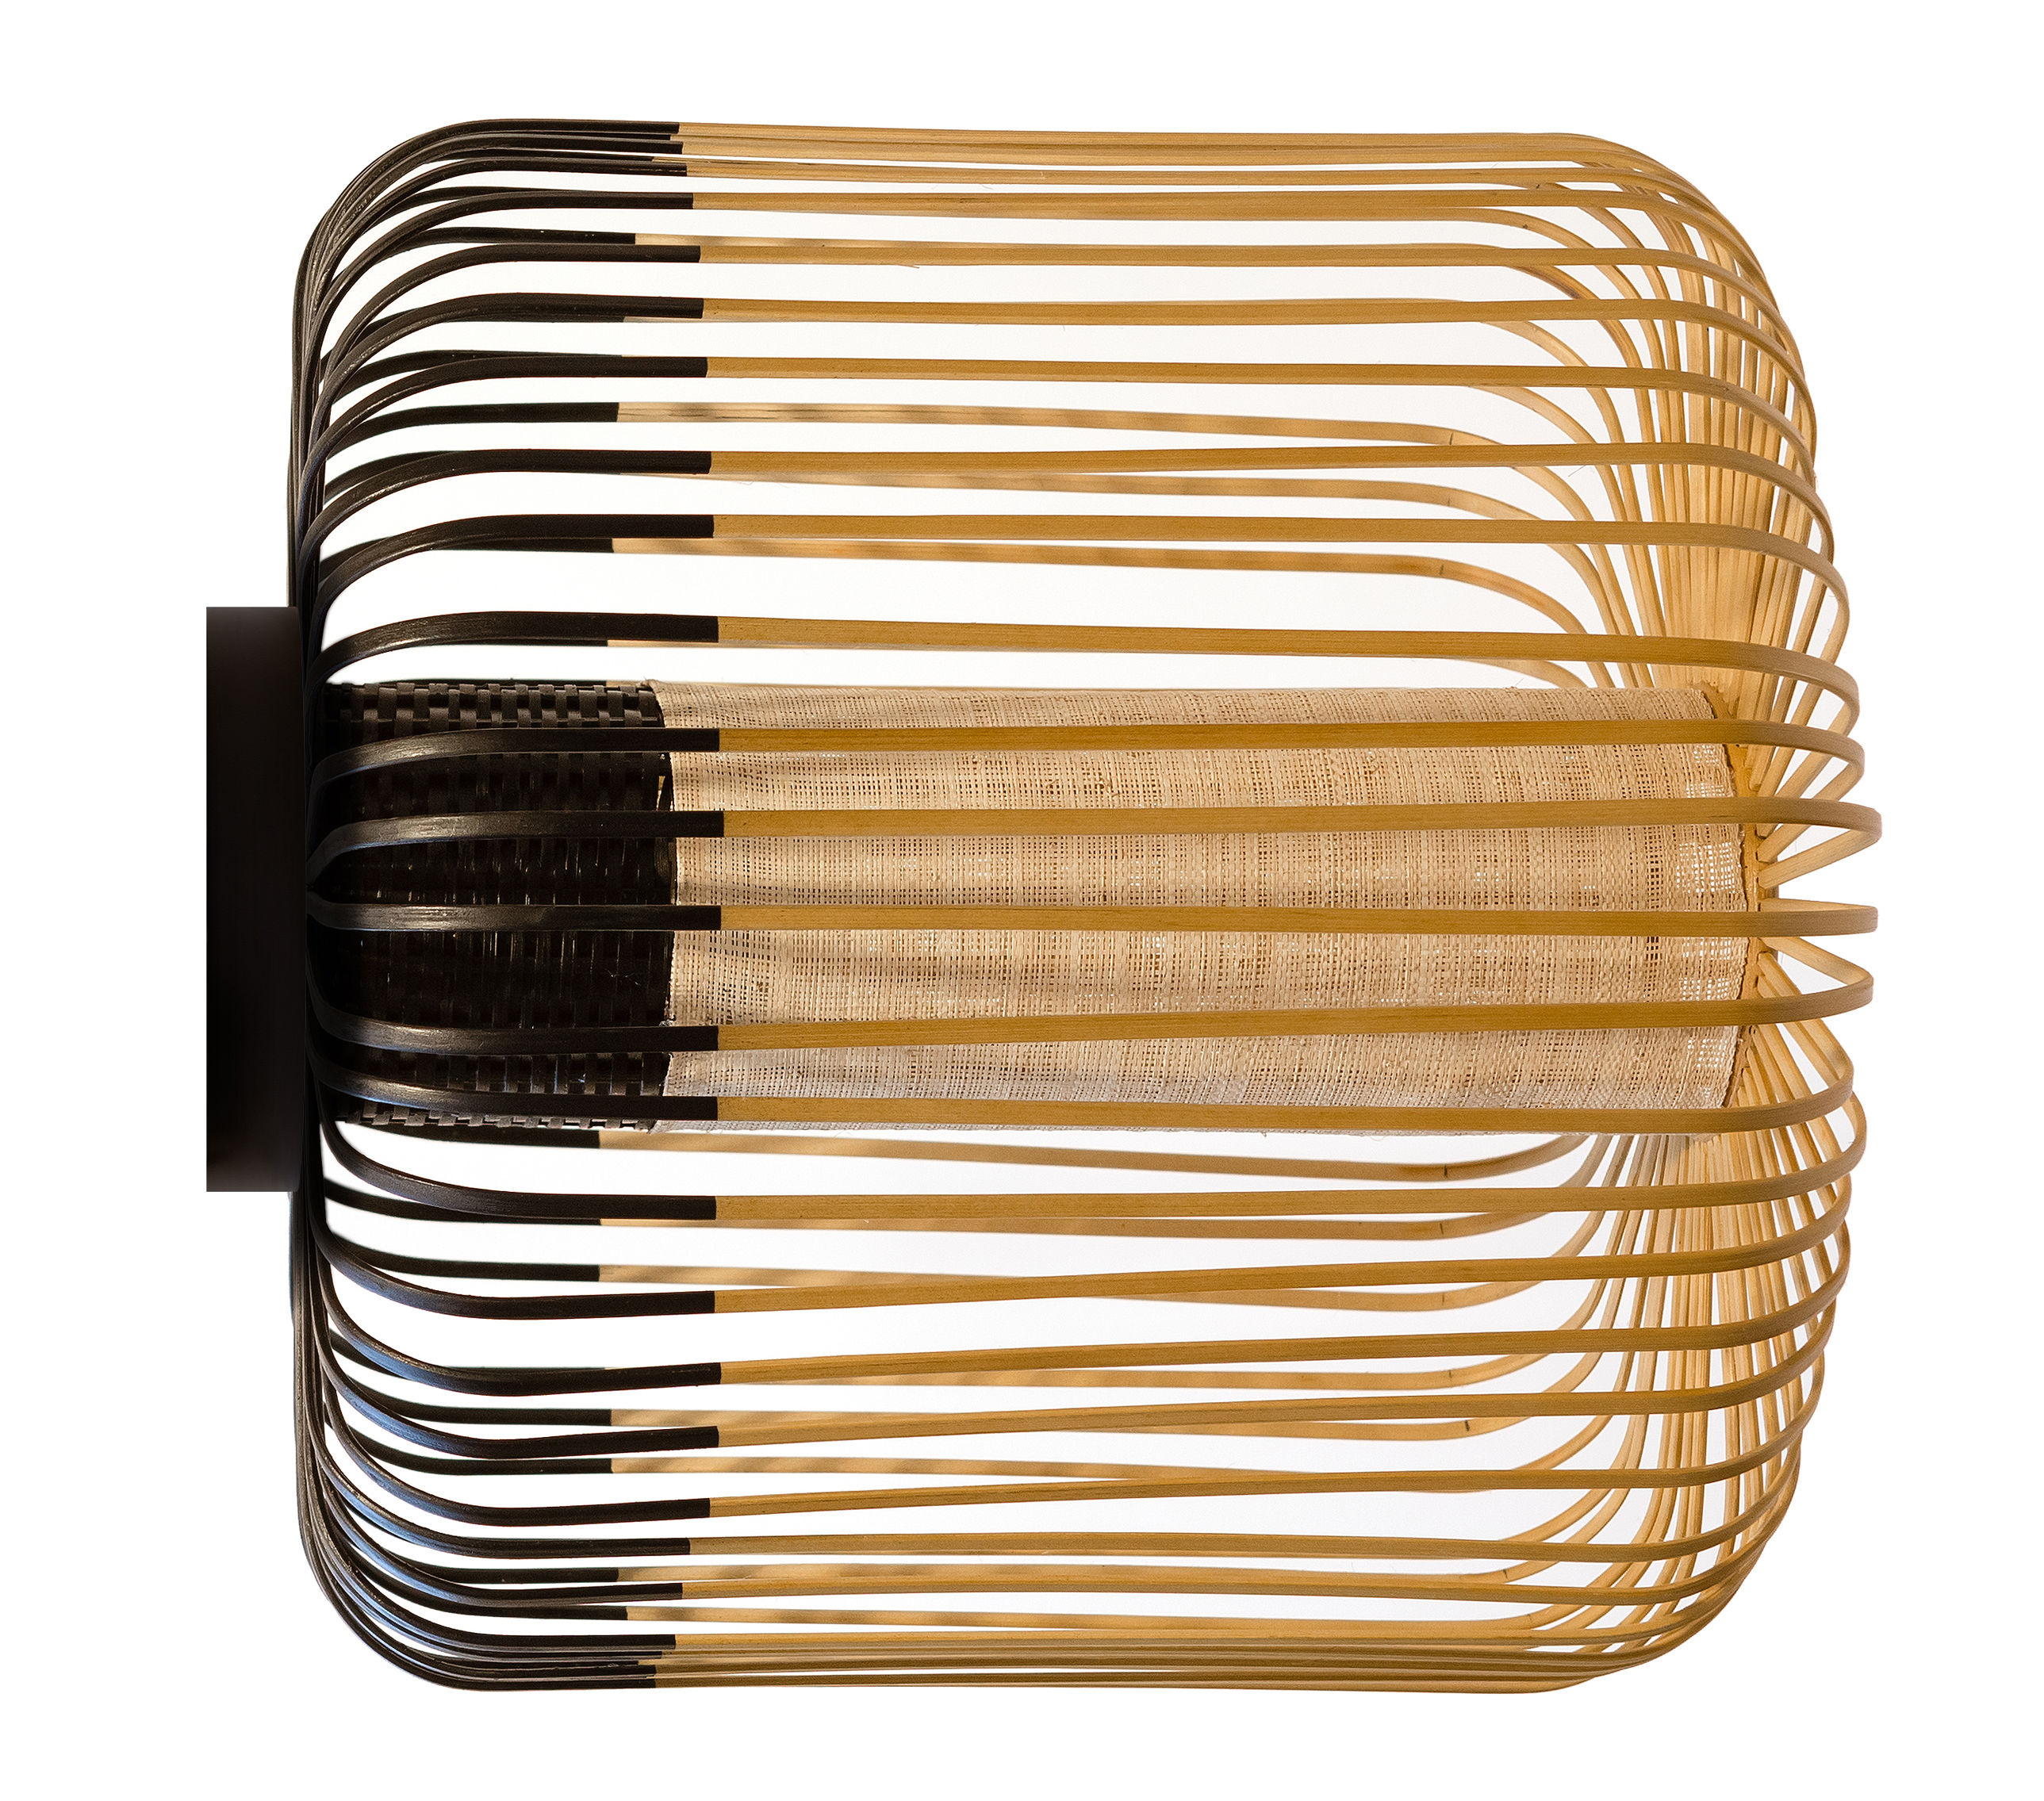 Illuminazione - Lampade da parete - Applique Bamboo light M / Plafoniera - Ø 45 x H 40 cm - Forestier - Noir / Naturel - Bambù naturale, Tessuto